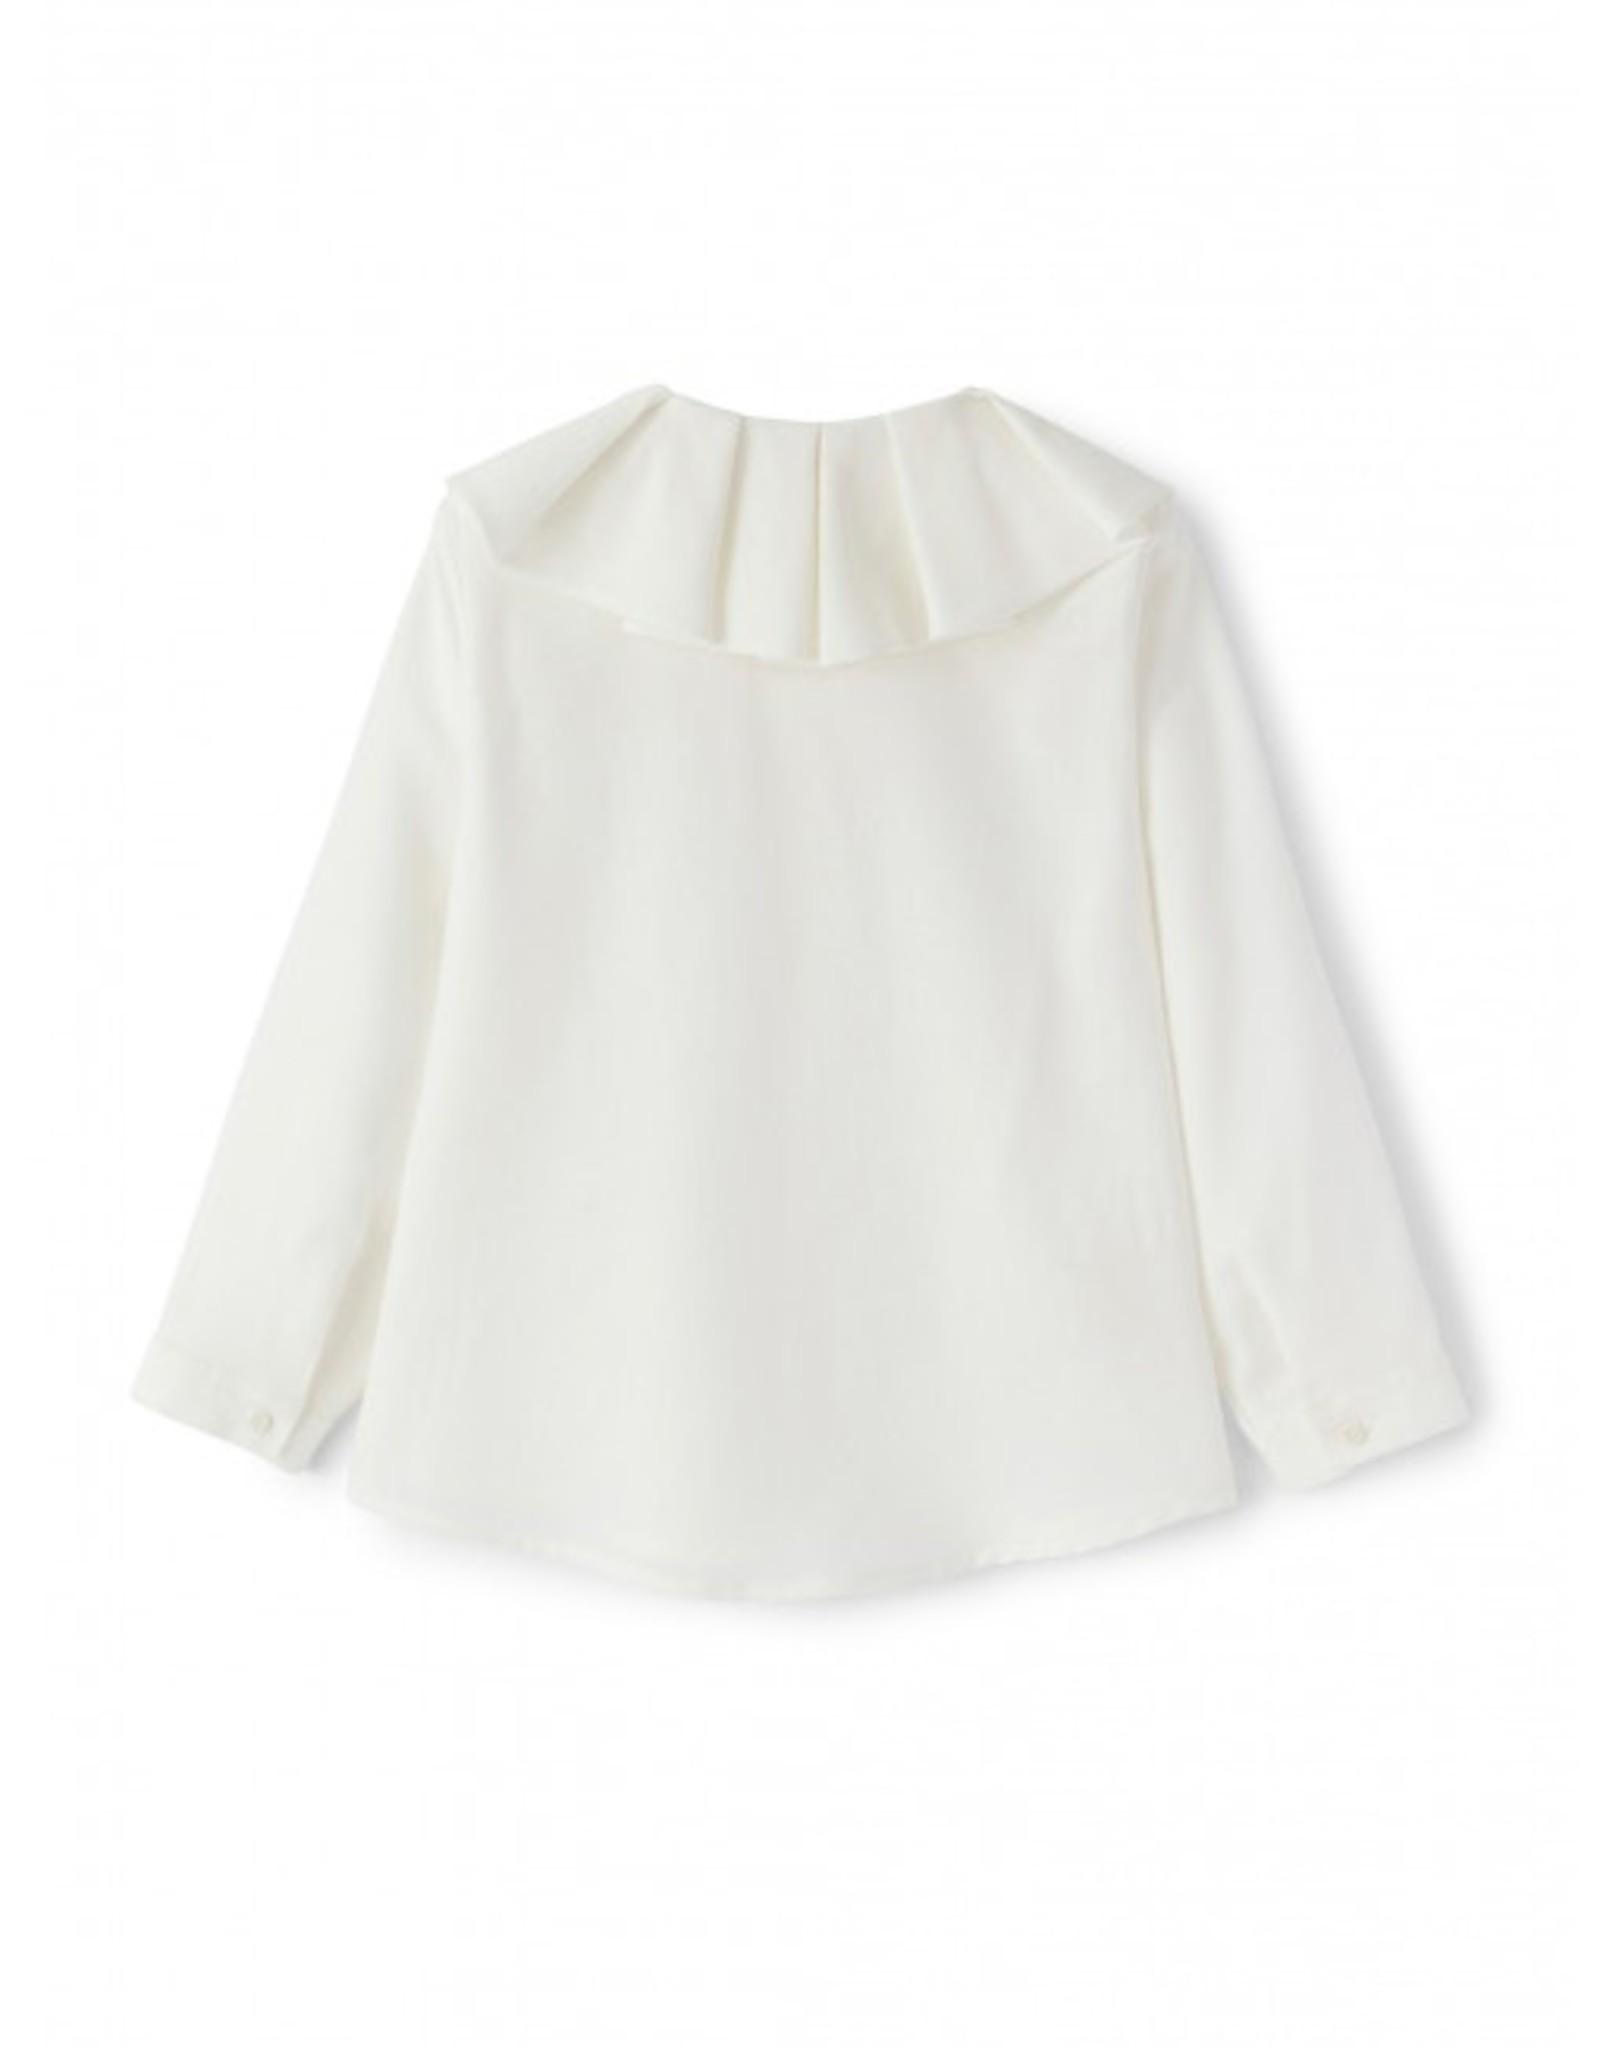 IL GUFO IL GUFO Witte blouse met kraag